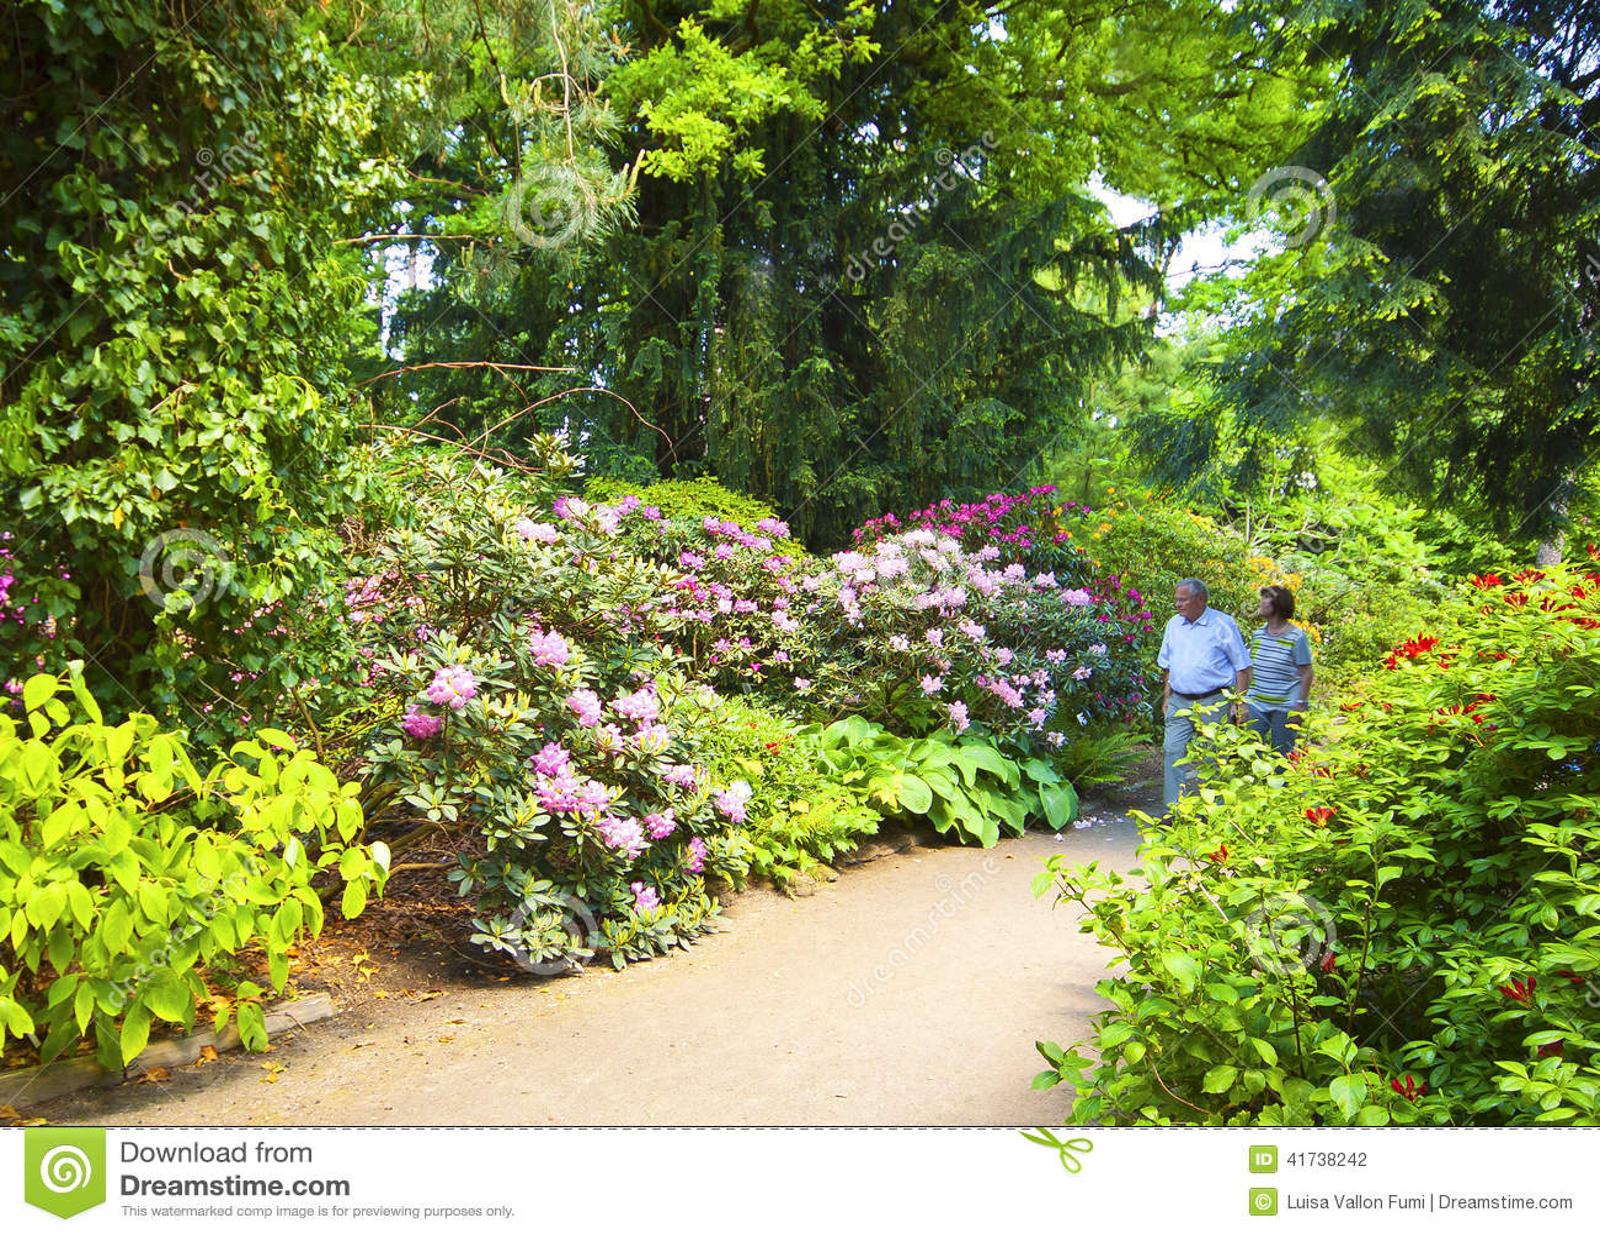 Elderly Couple Take A Walk In Munich Botanical Garden Editorial Photography - Image: 41738242